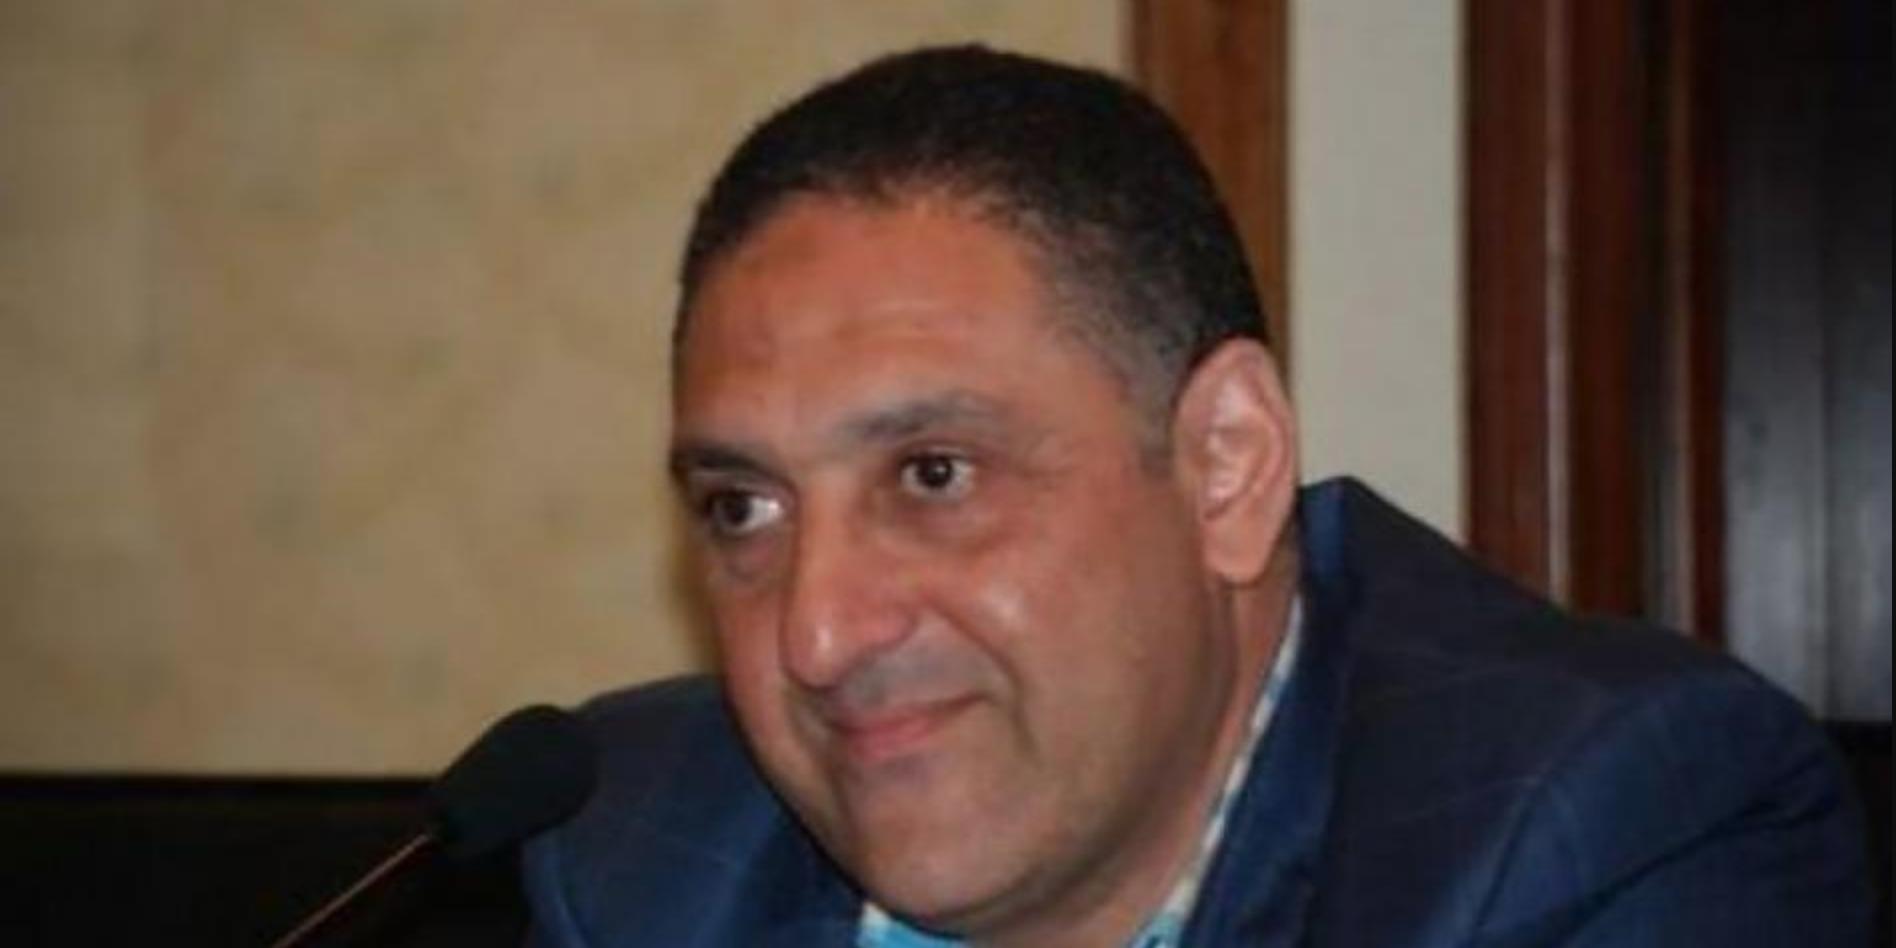 Hesham Gaafar, Egyptian writer and the head of Mada Foundation for Media Development